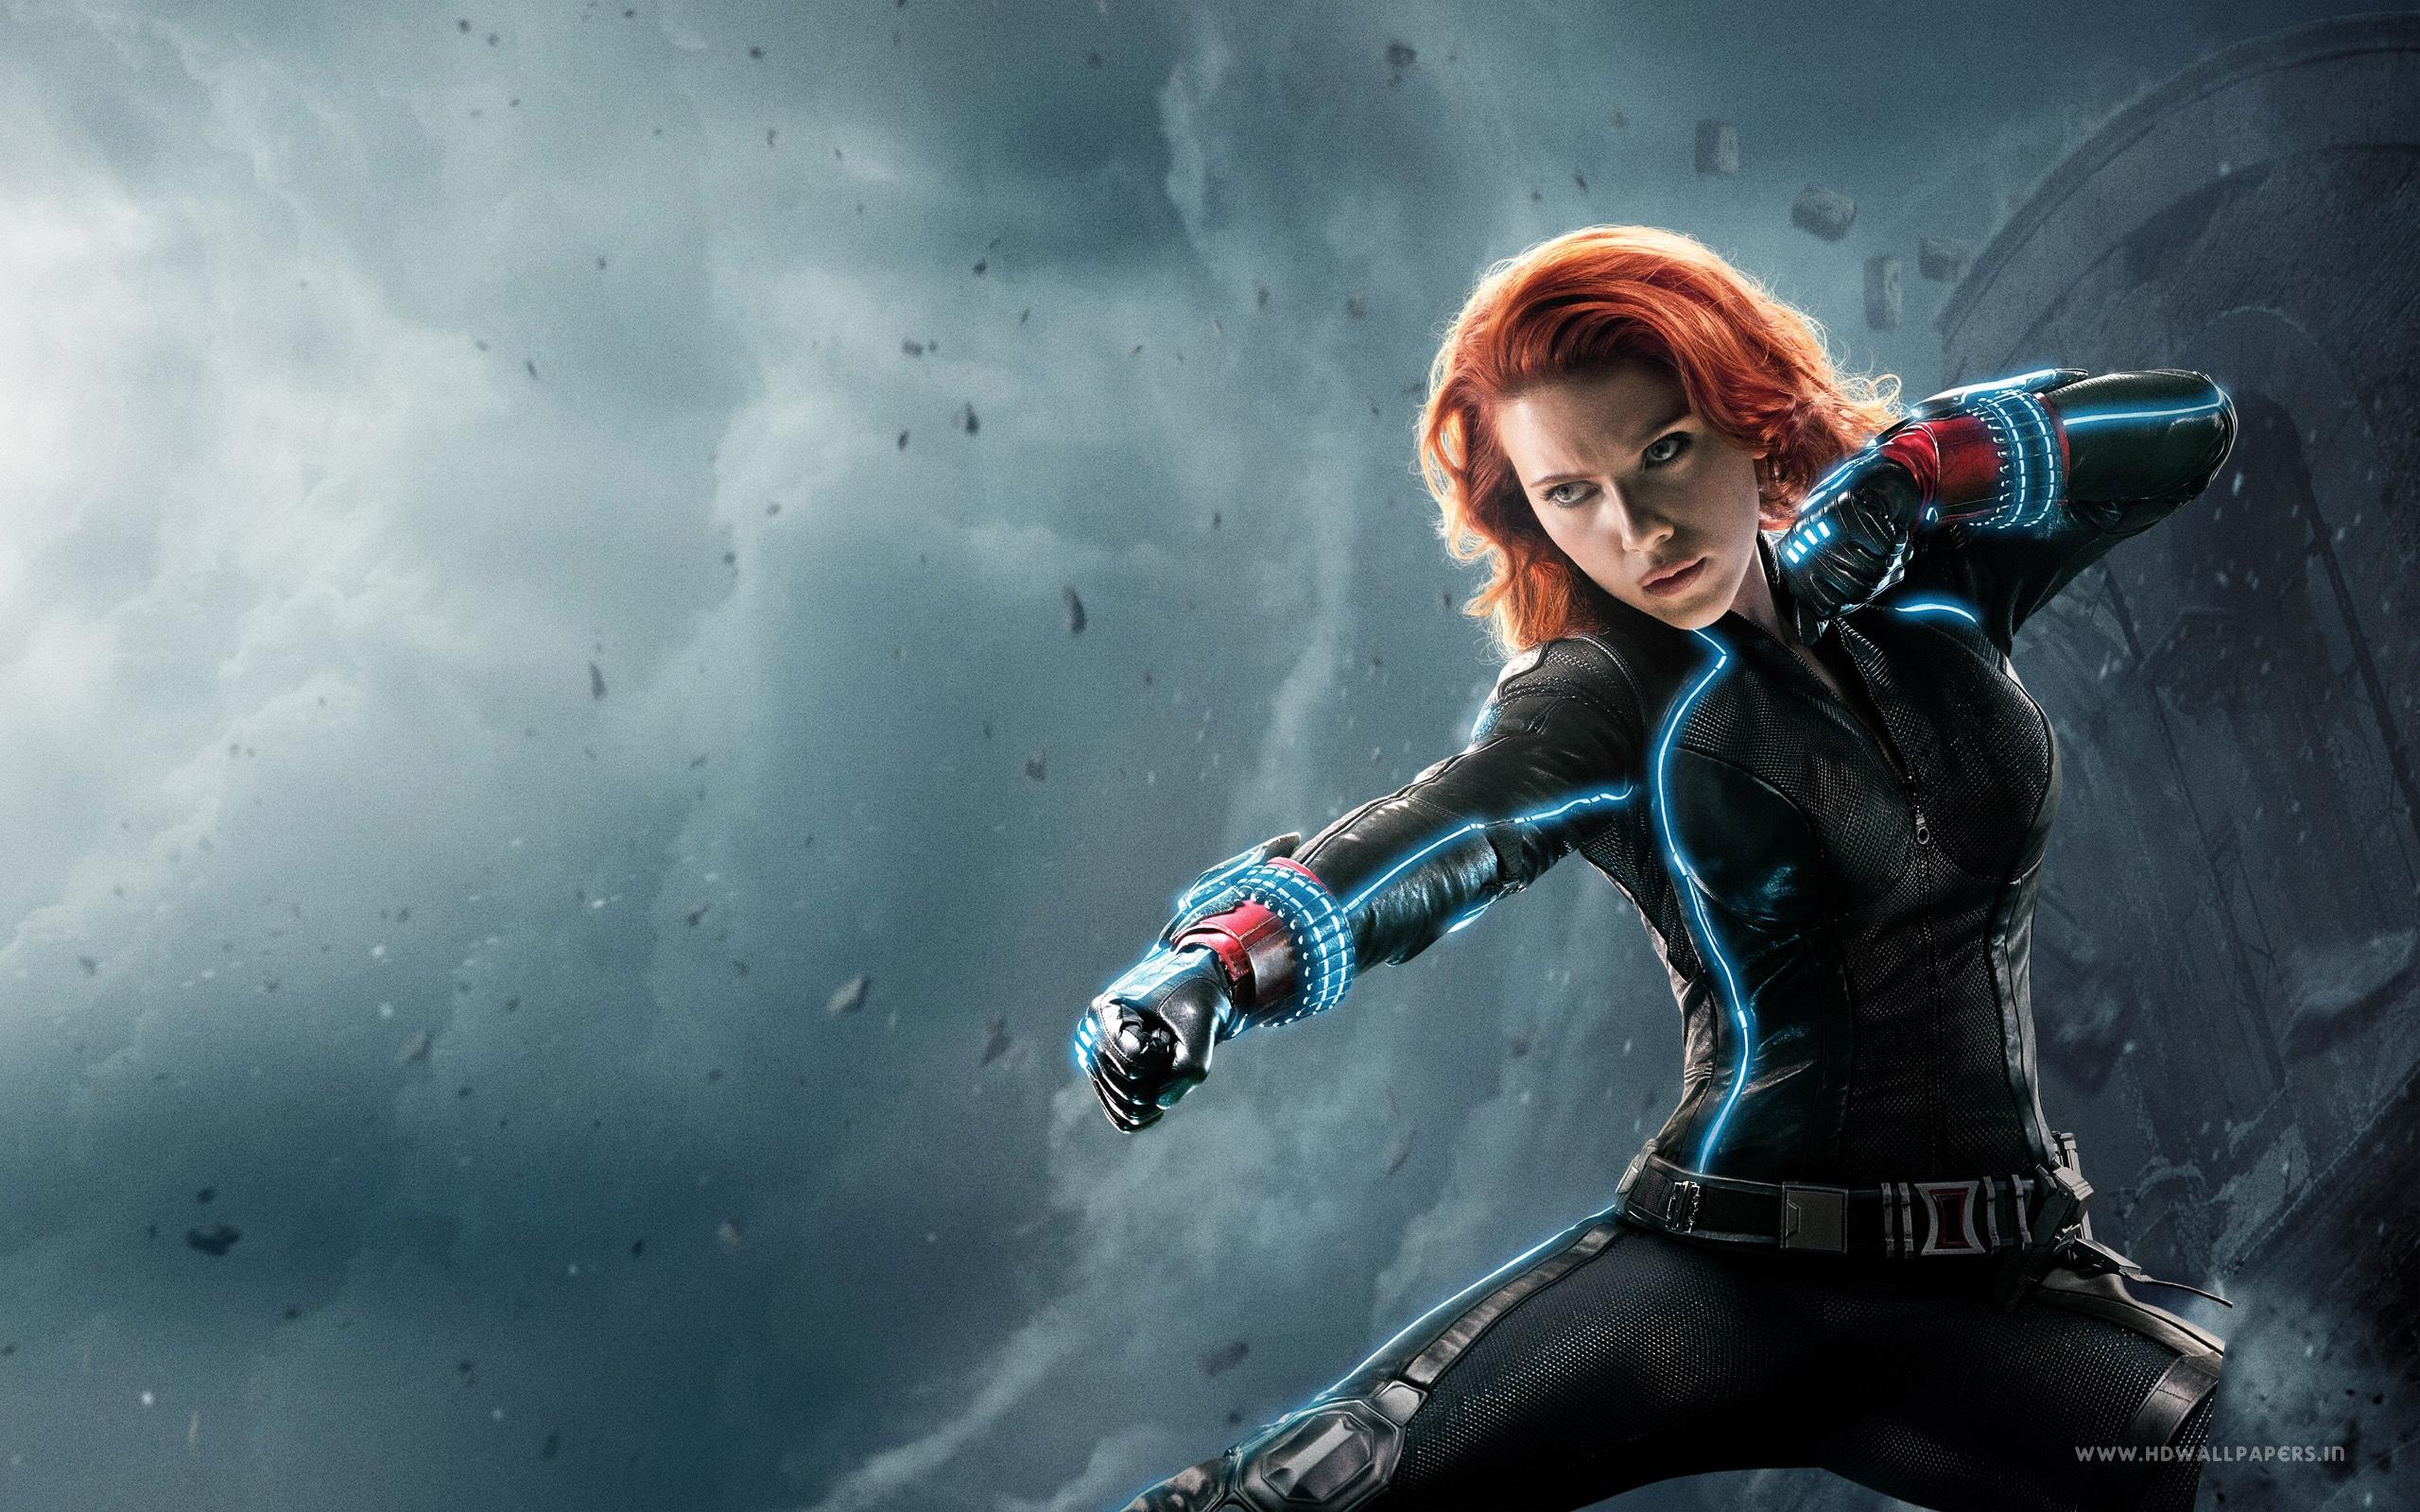 HD Wallpapers Avengers Age of Ultron Black Widow